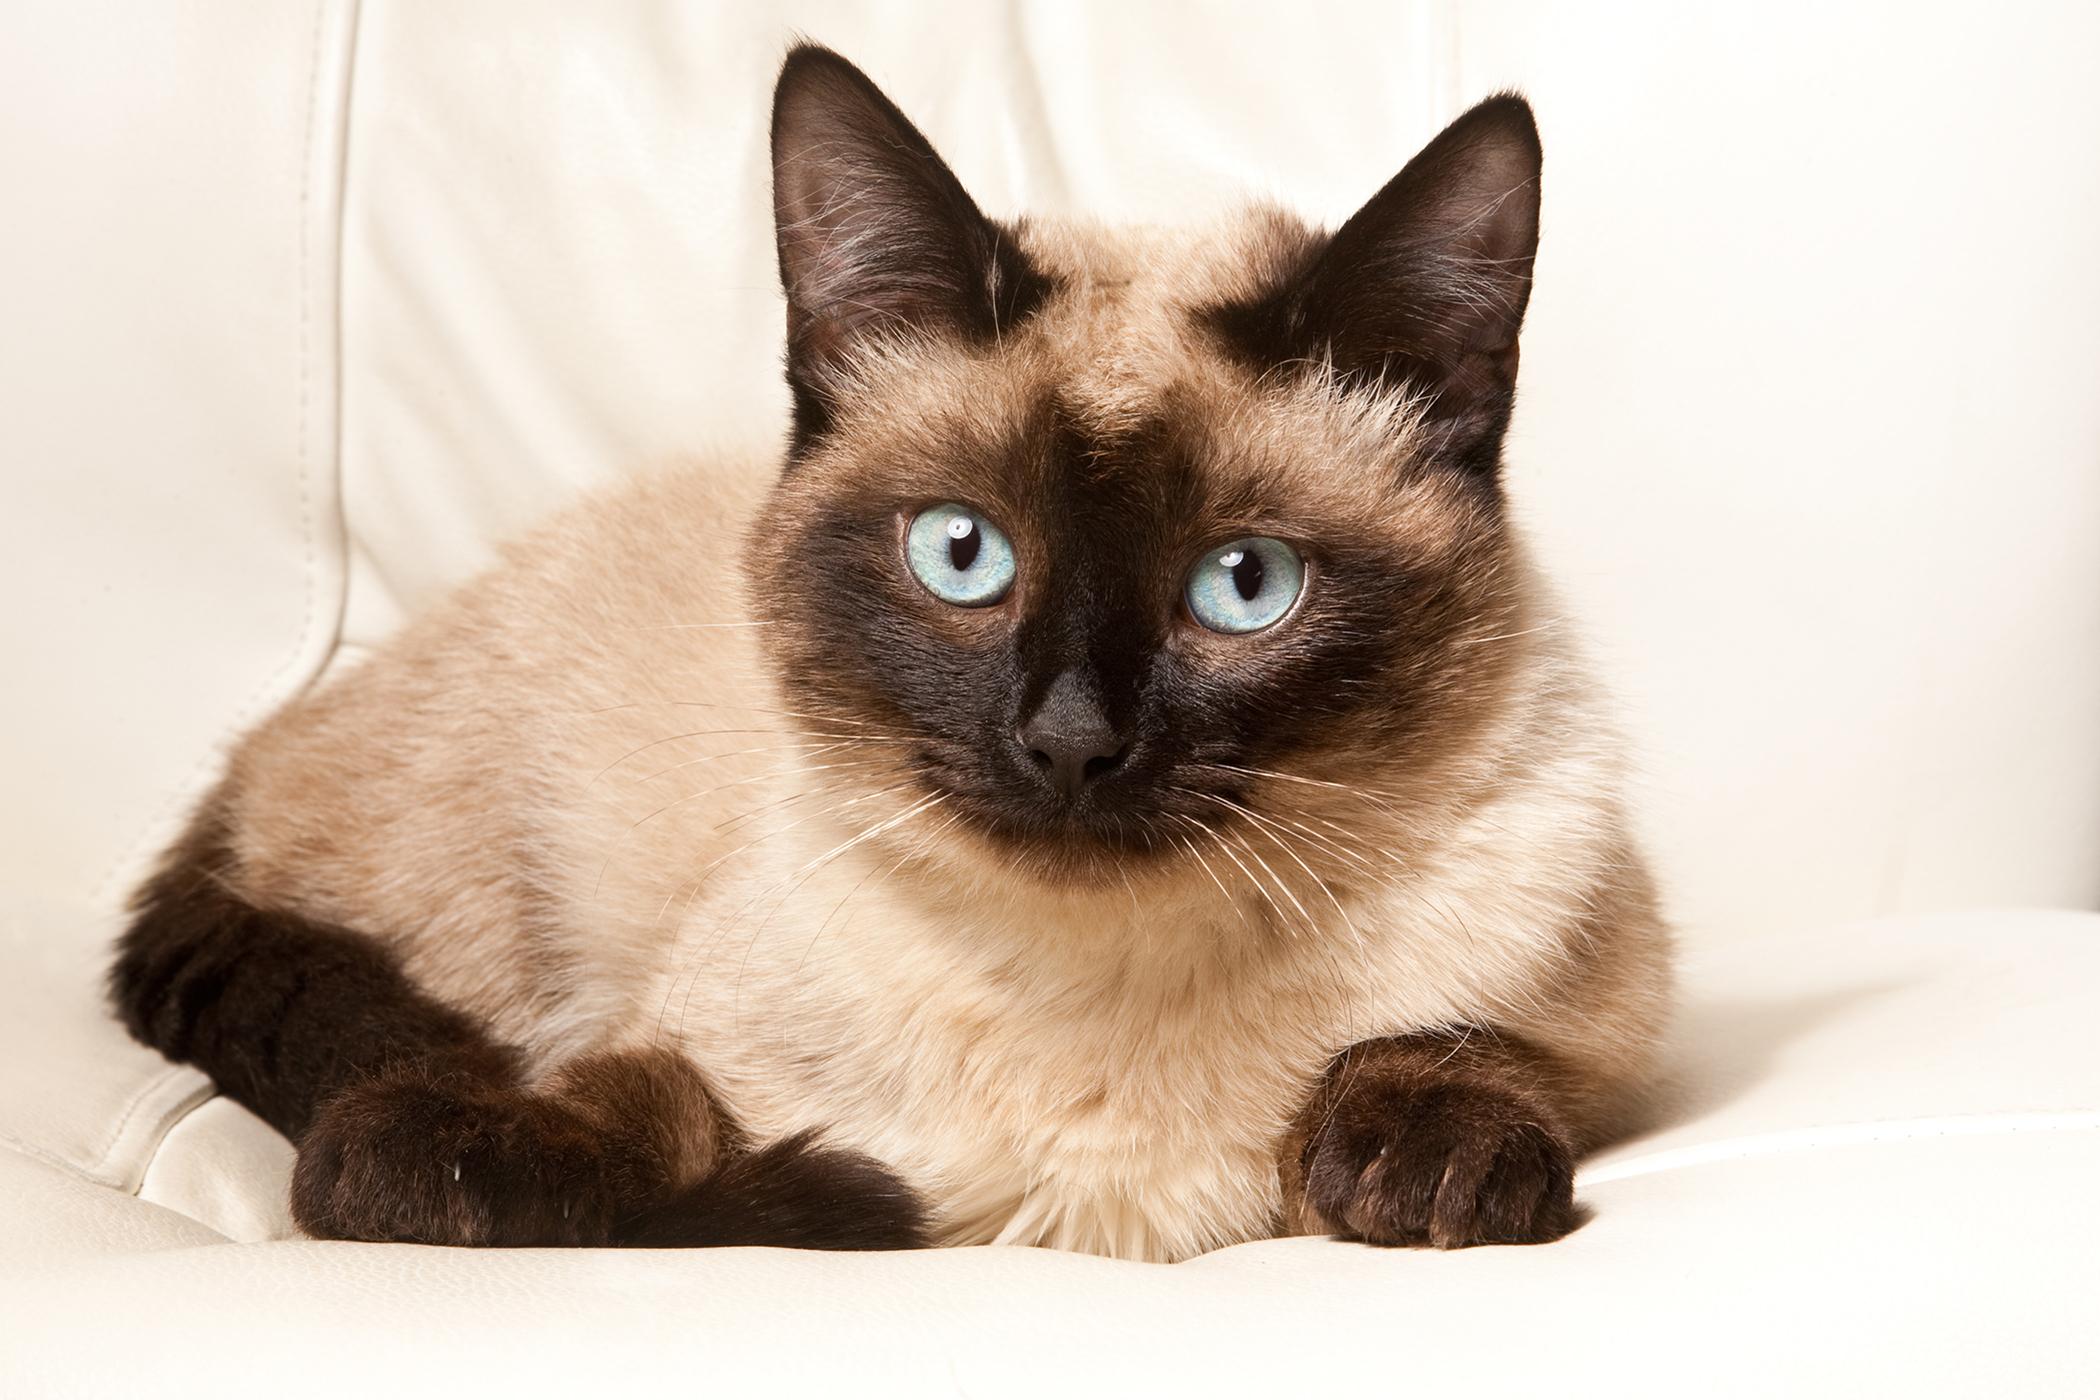 Megaloblastic Anemia in Cats